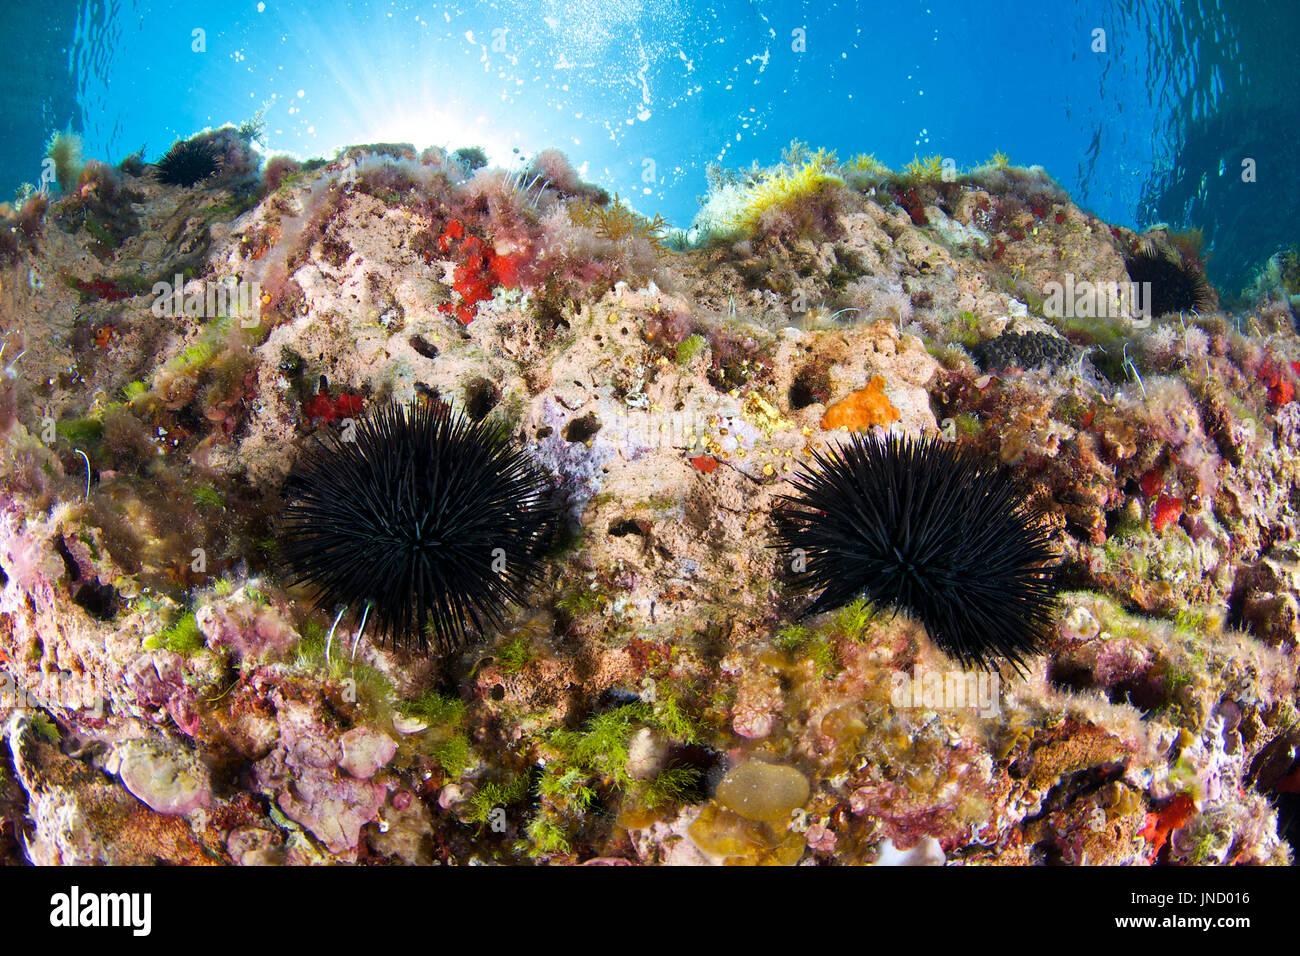 A pair of black sea urchin (Arbacia lixula) with sunbeams at the background at Ses Salines Natural Park at Formentera (Balearic Islands, Spain) - Stock Image